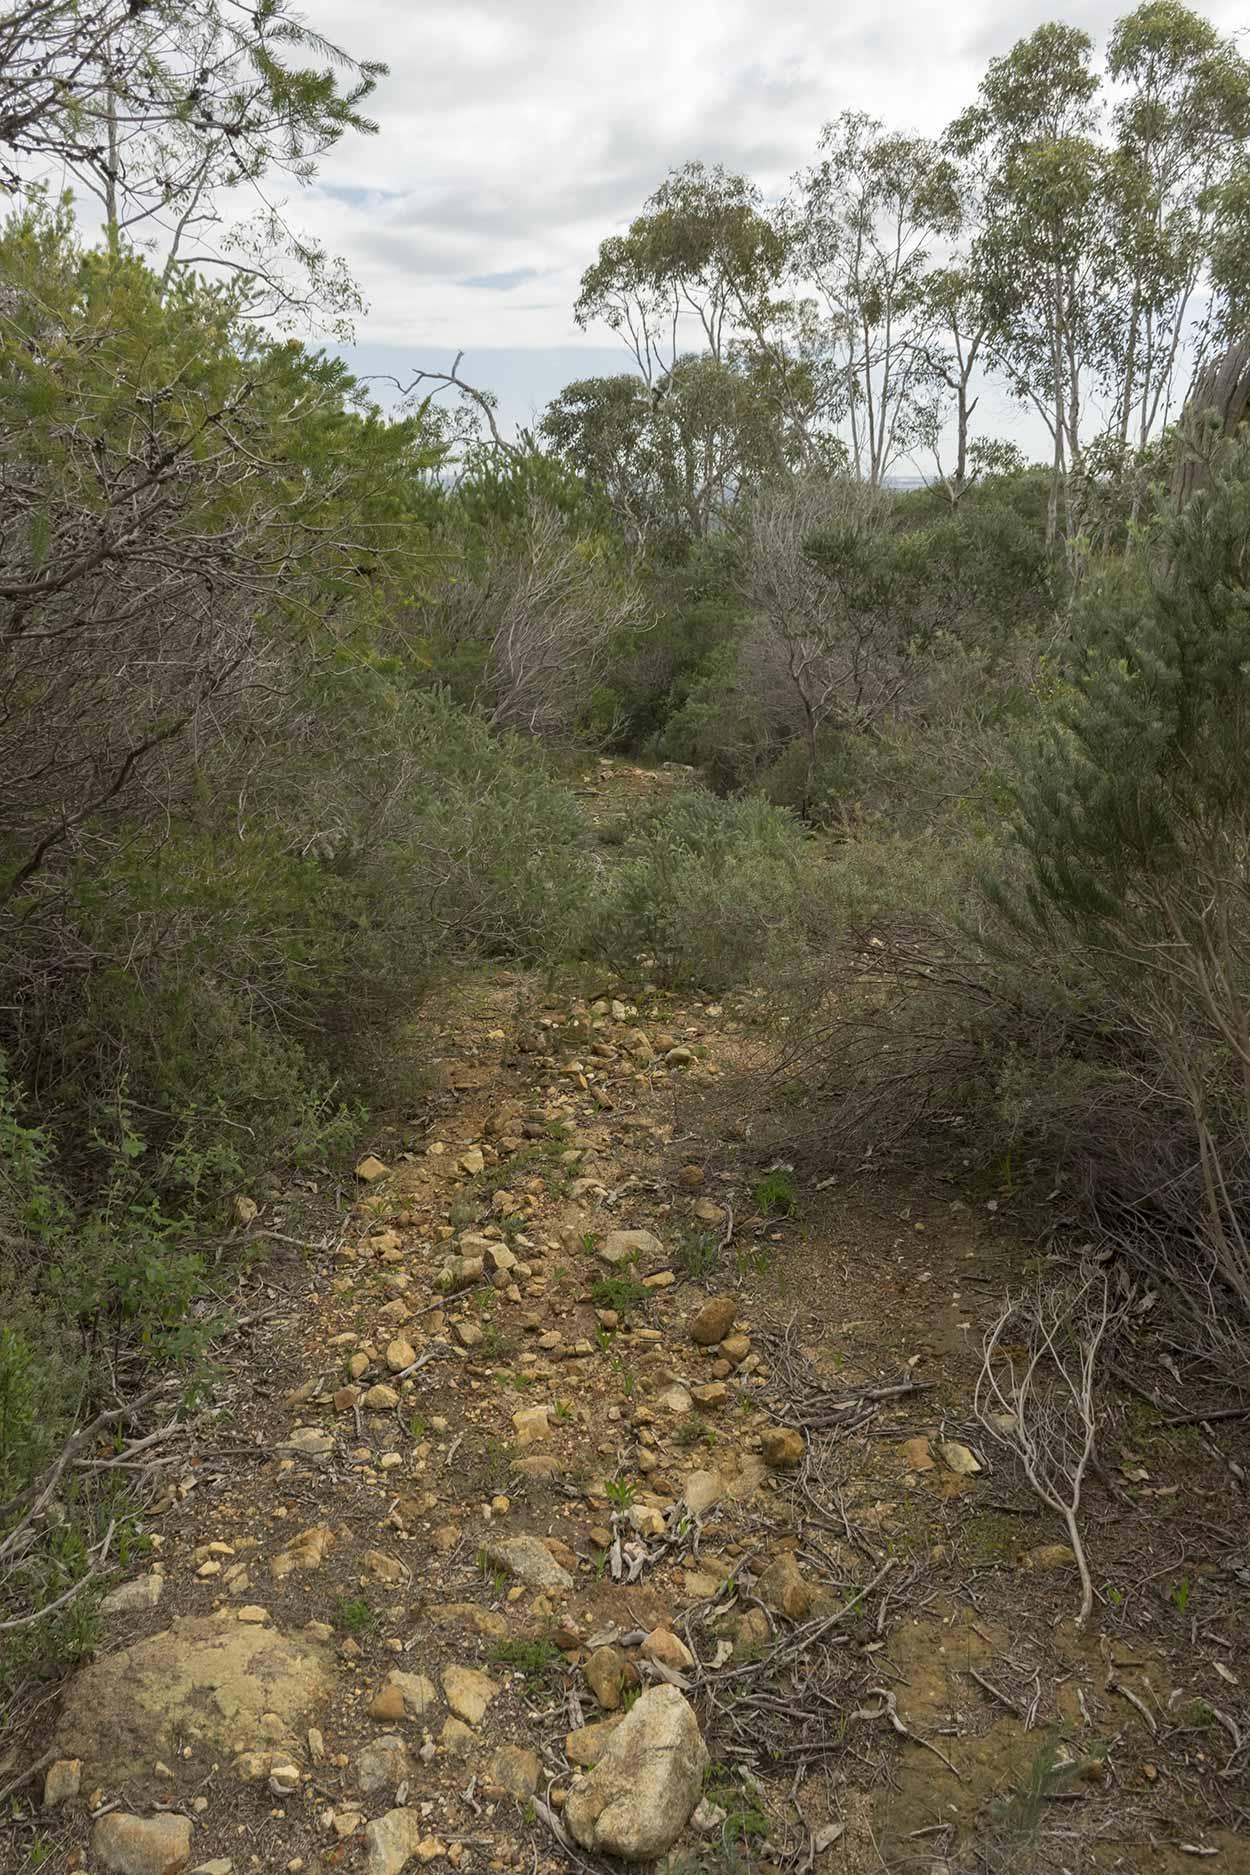 Overgrown path in Wungong Regional Park, Perth, Western Australia